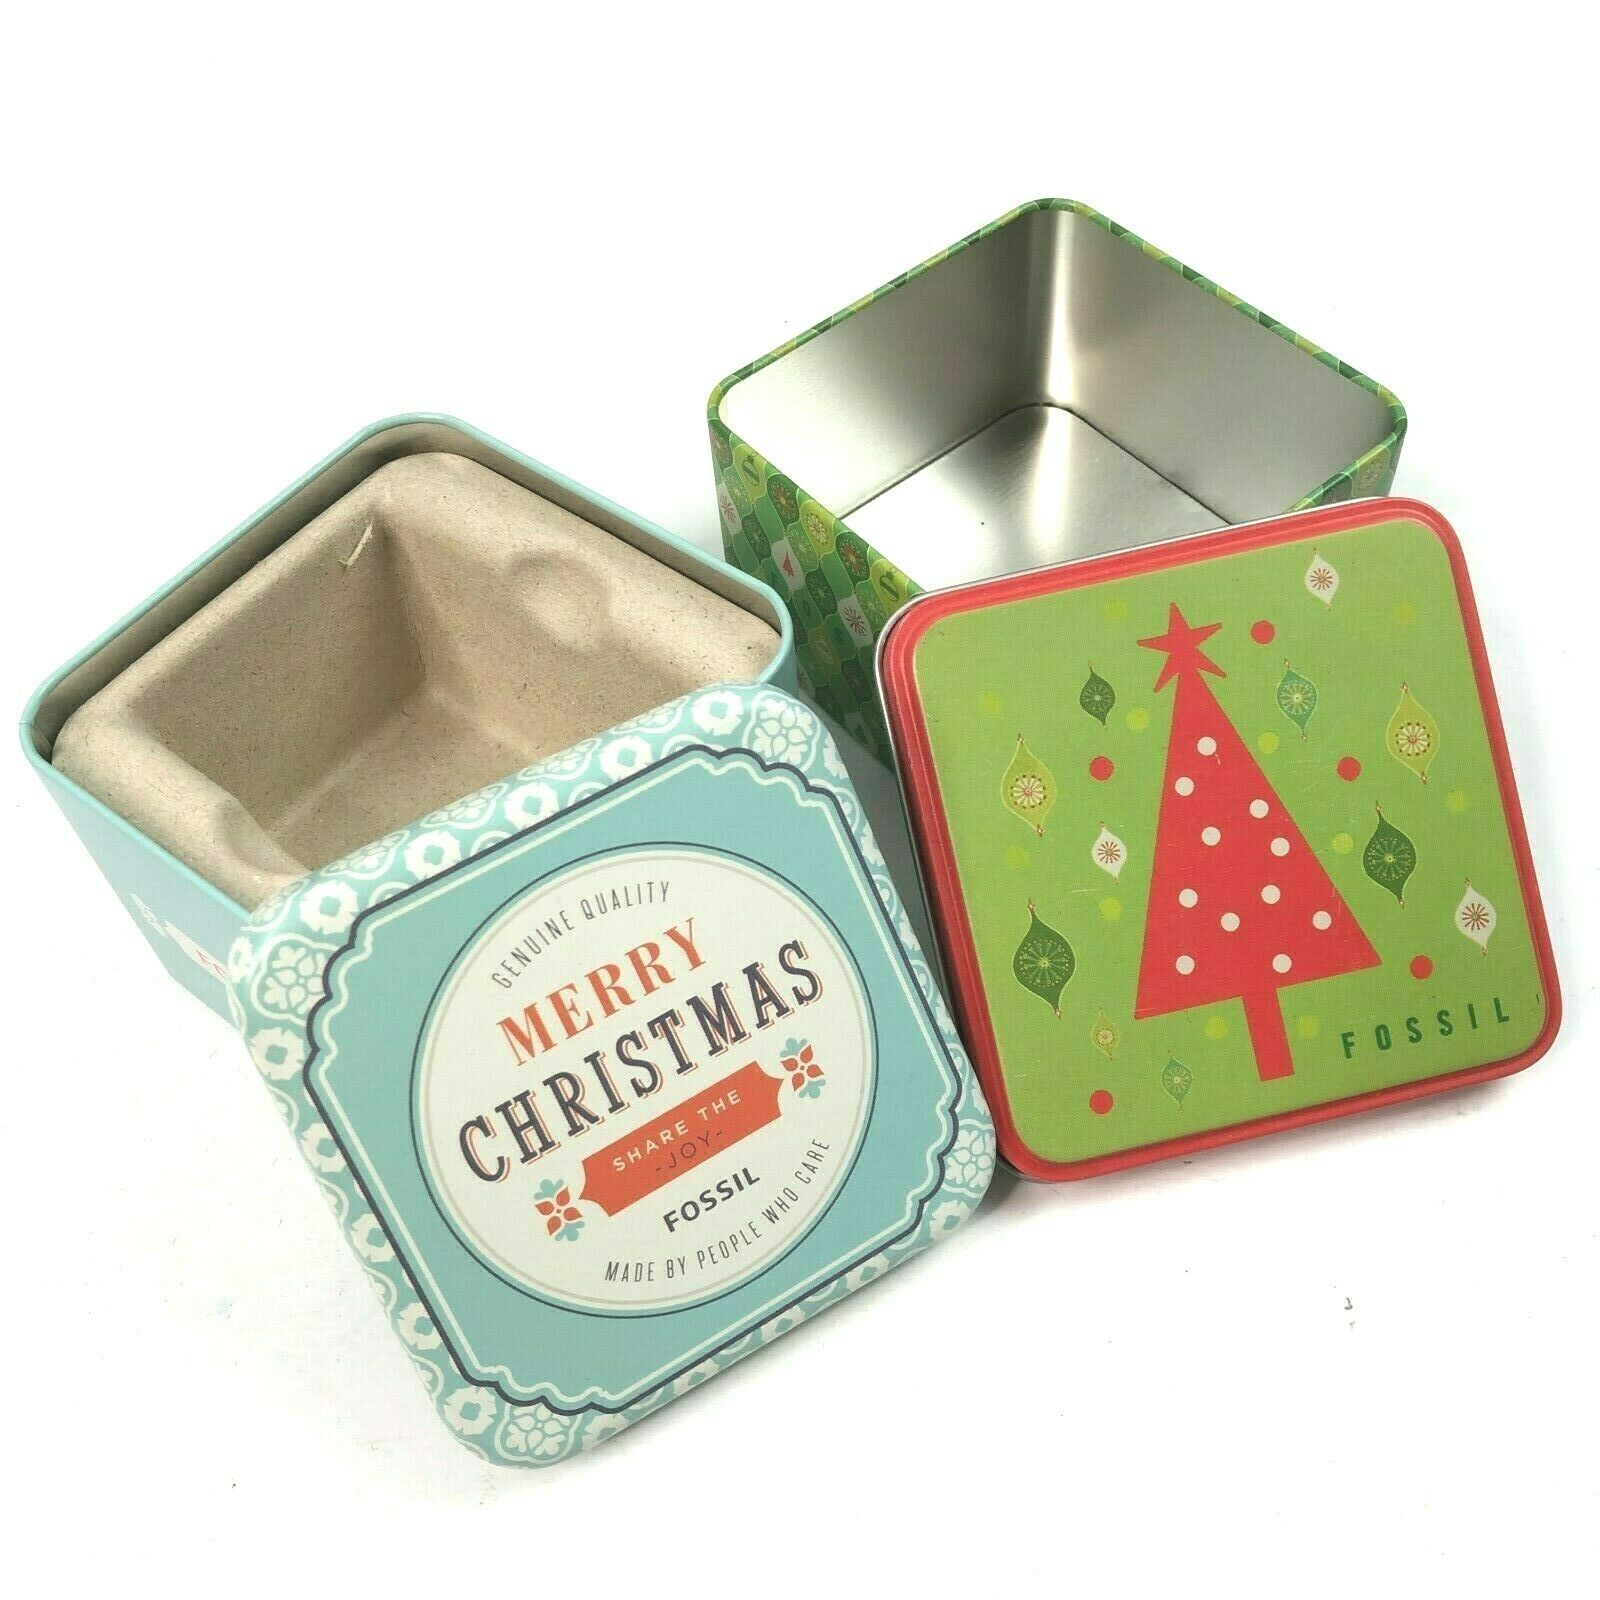 Fossil Christmas Tins 2 Retro Small Gift Box Bundle Holiday 2003 2010 Empty - $24.04